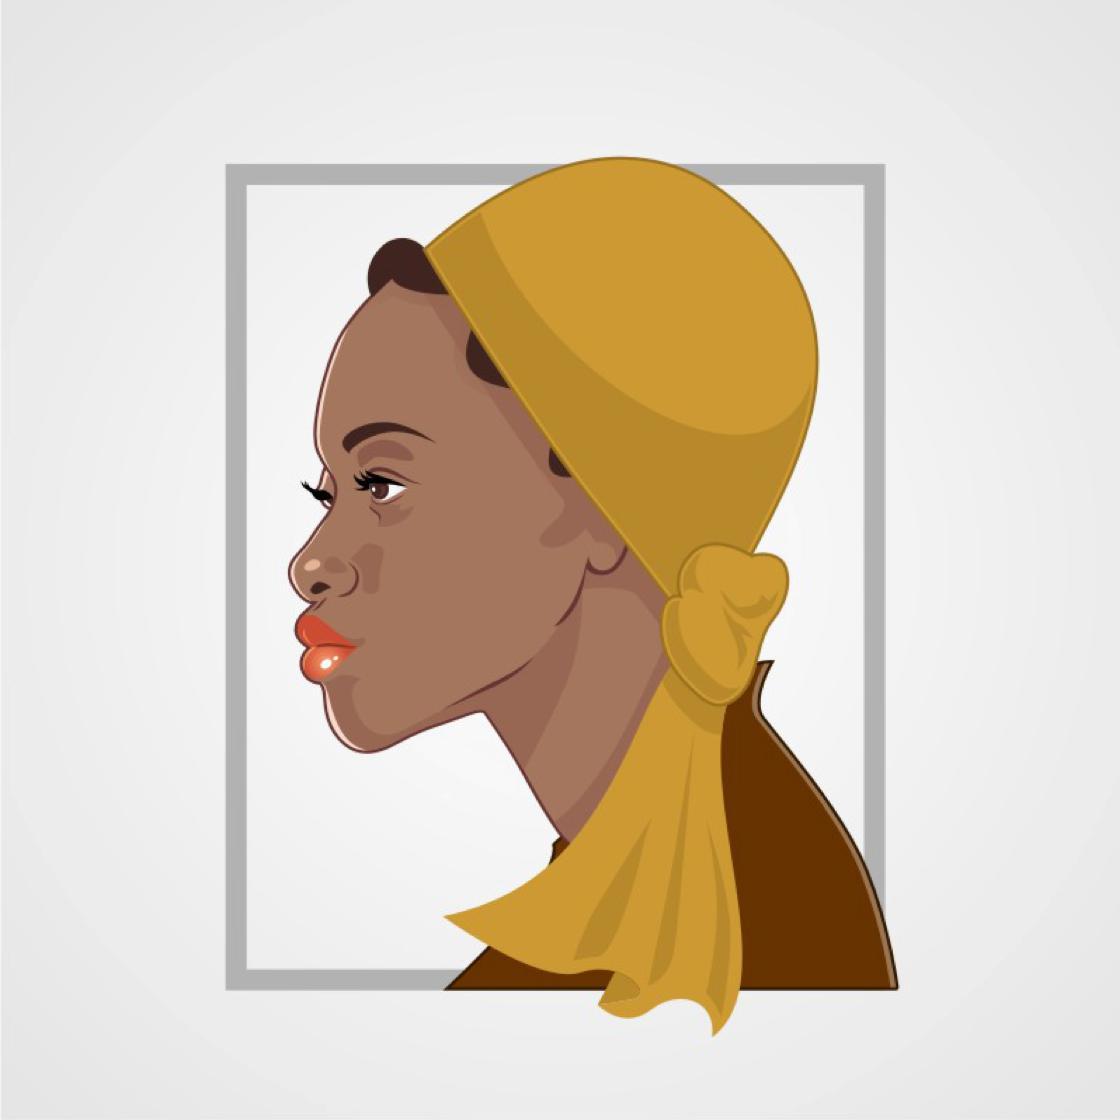 illustration designed by beto